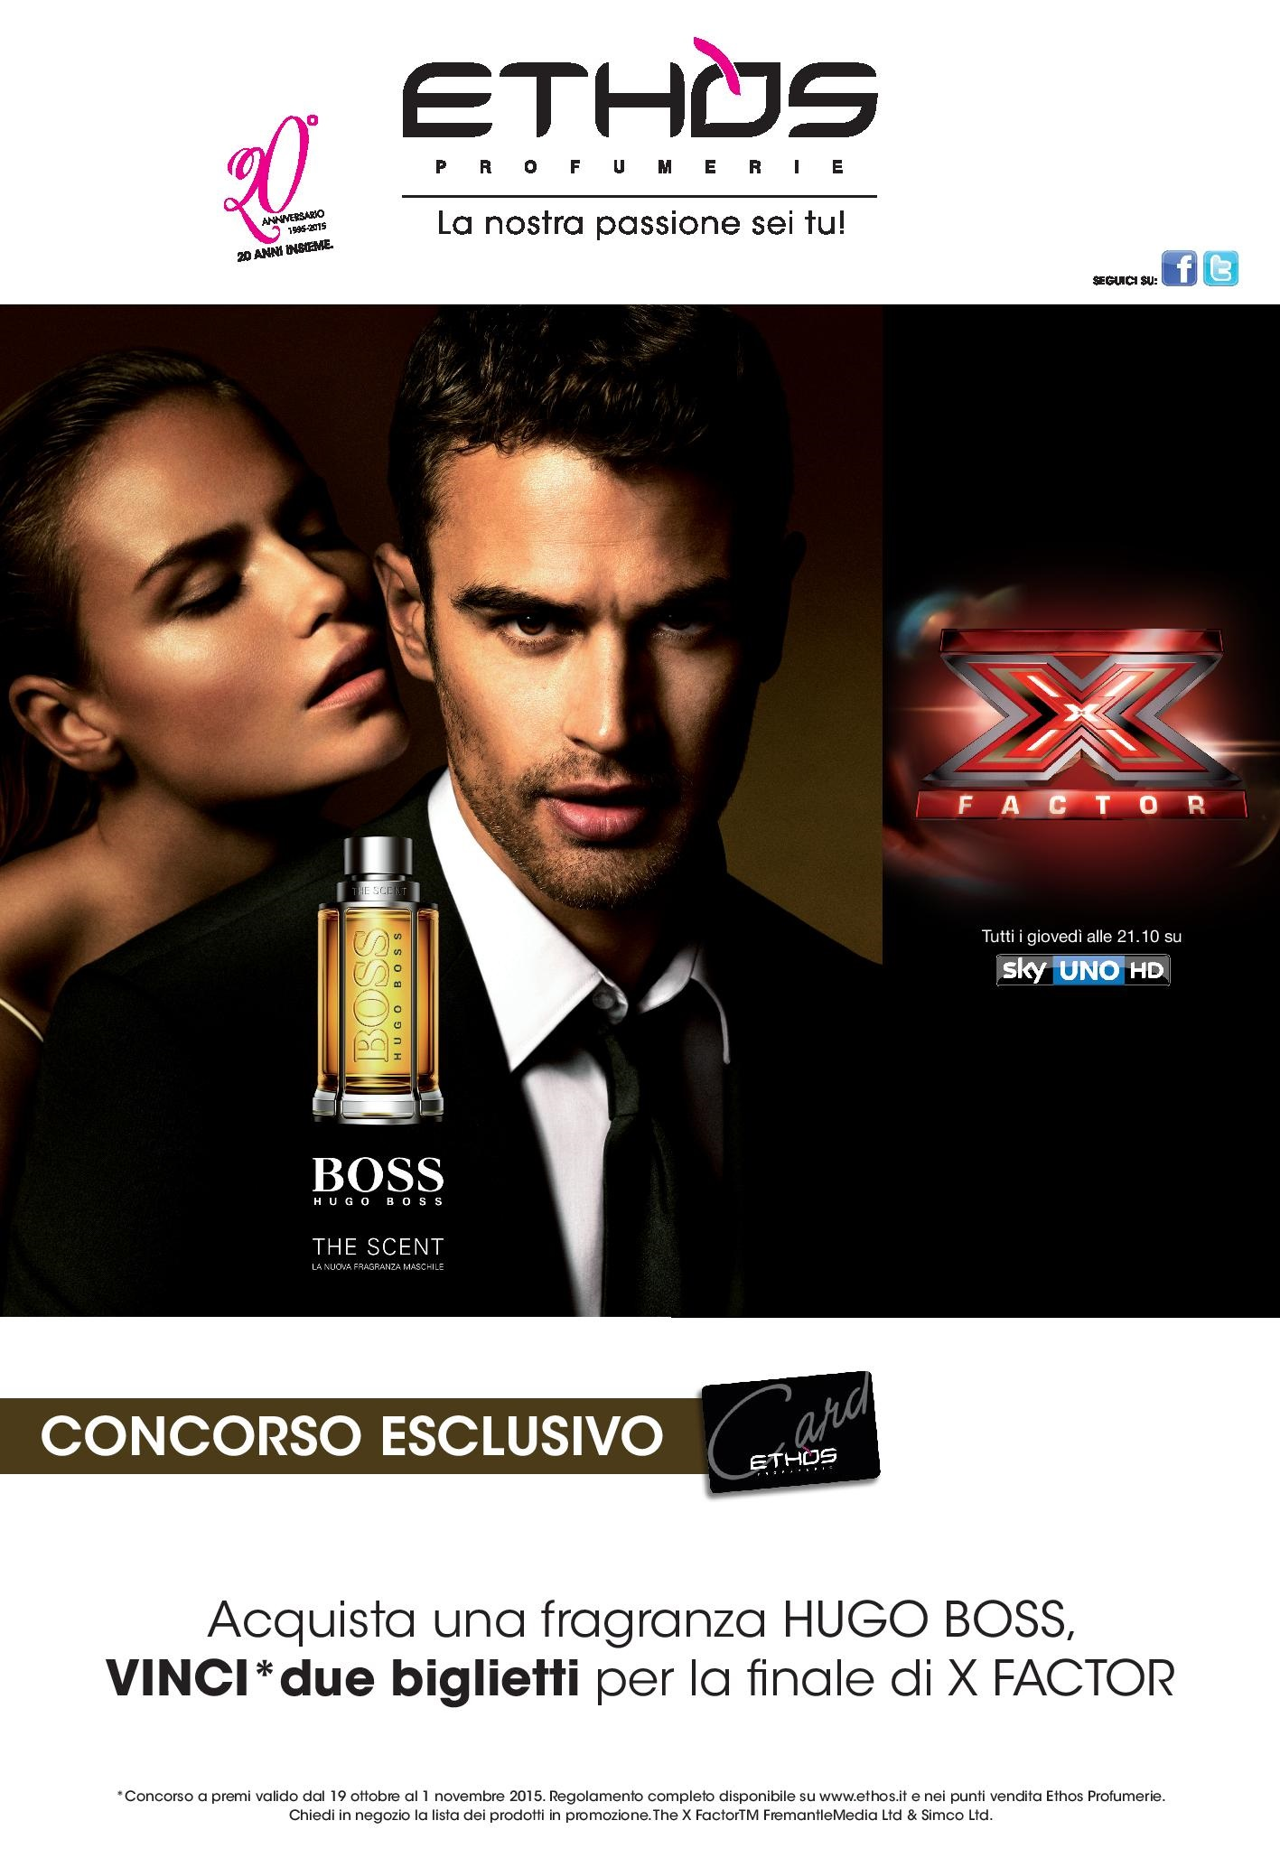 Da Ethos Profumerie con Hugo Boss e Sisley puoi vincere X Factor e Roma!